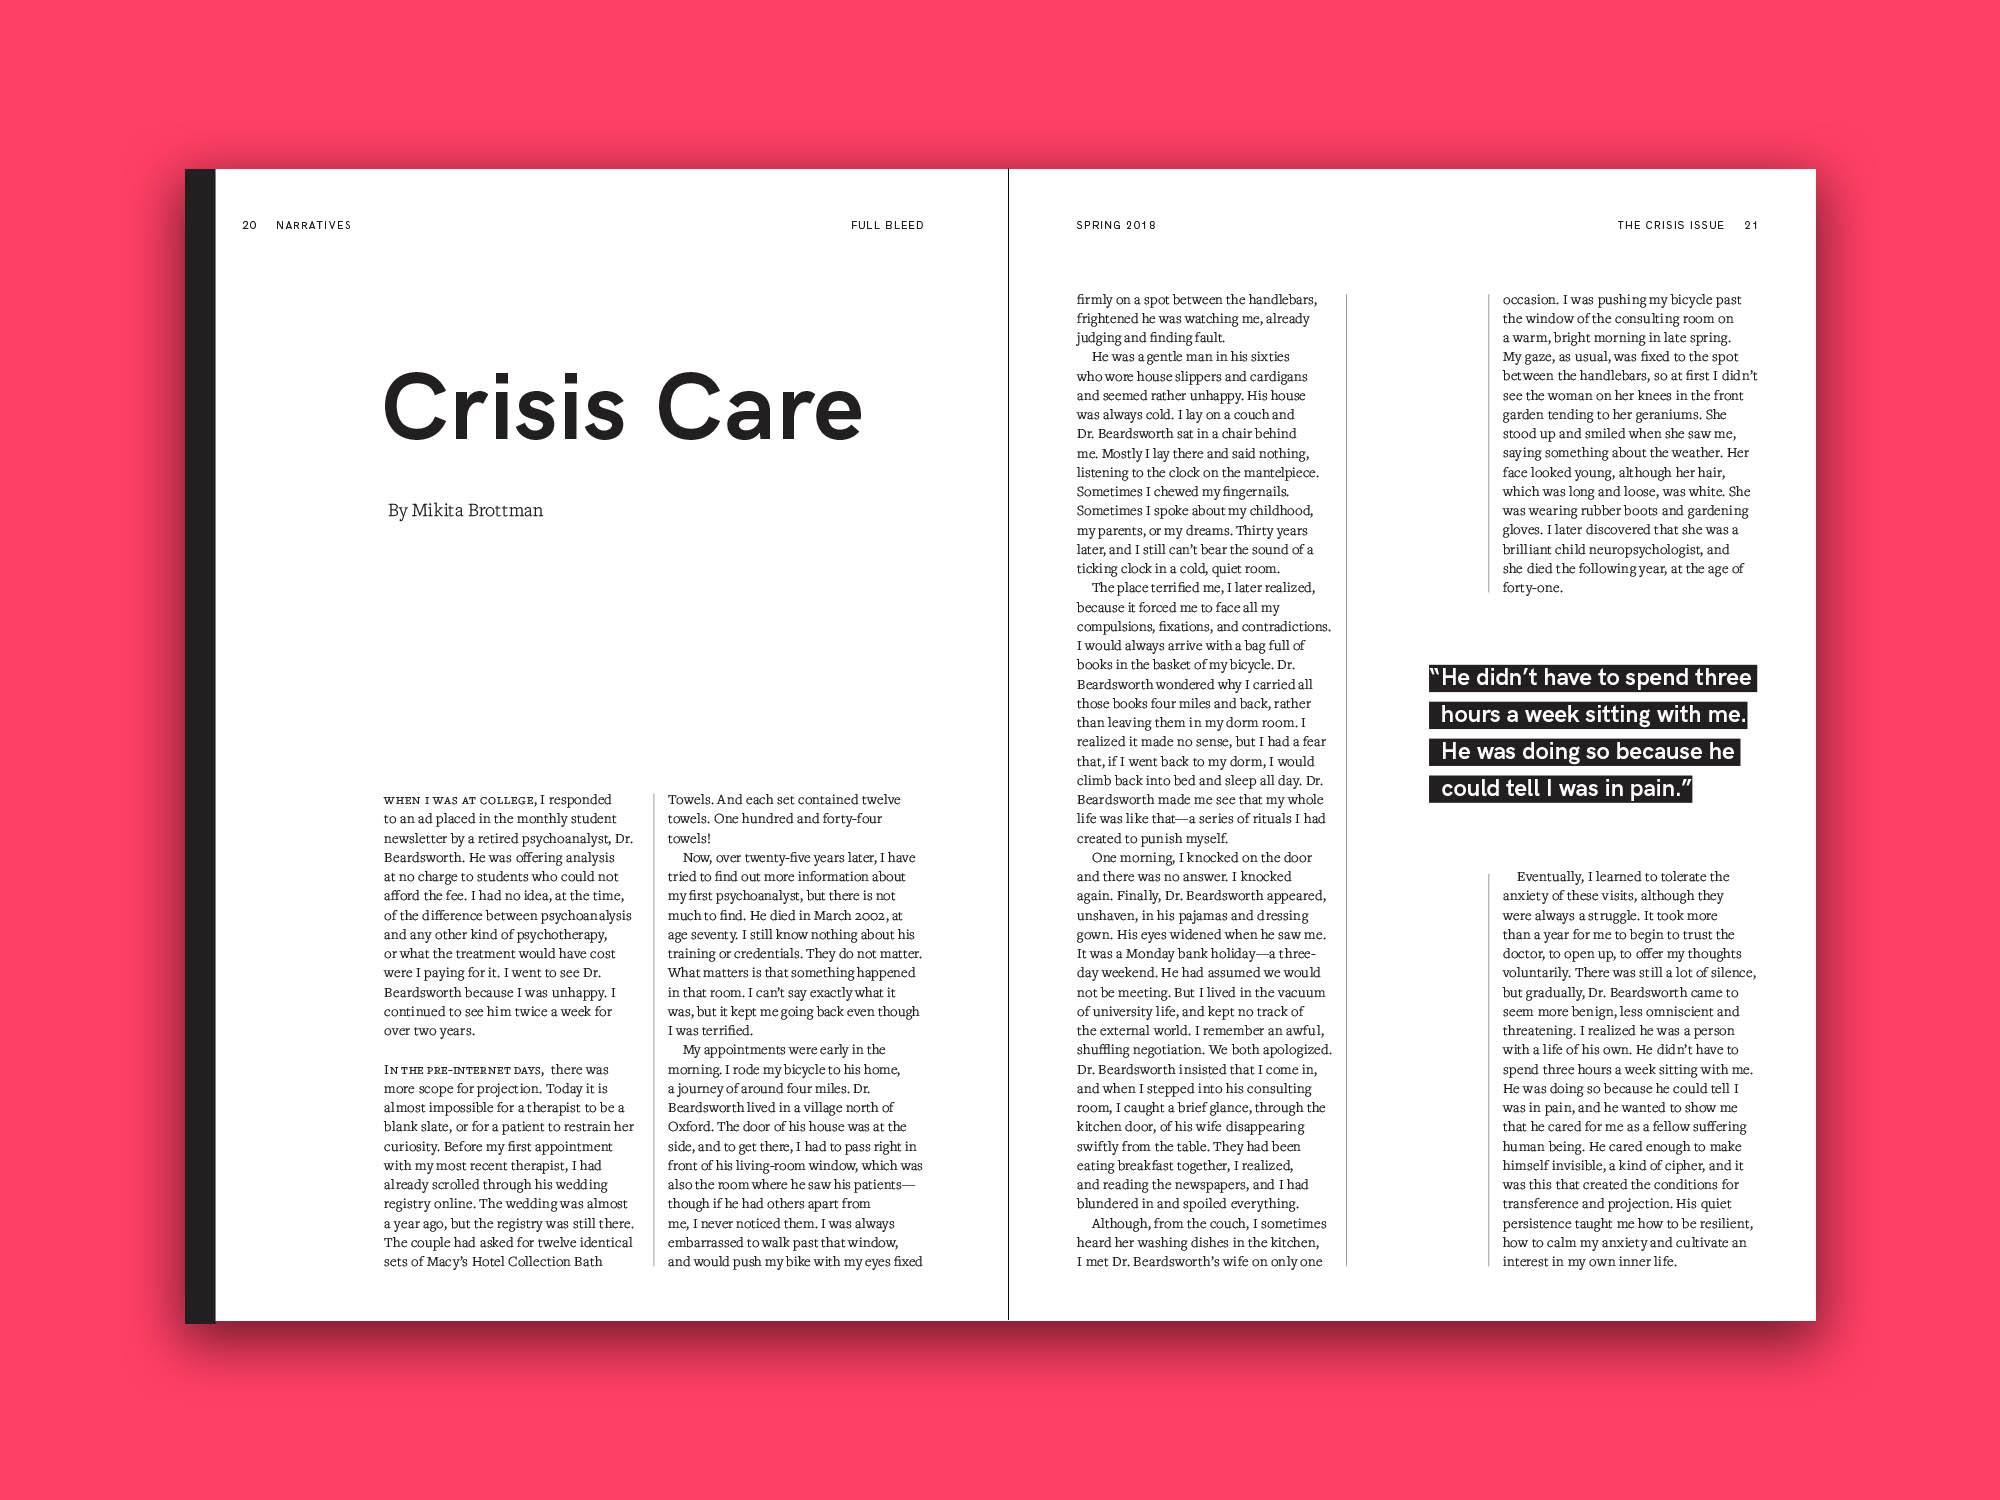 crisis care 1.jpg